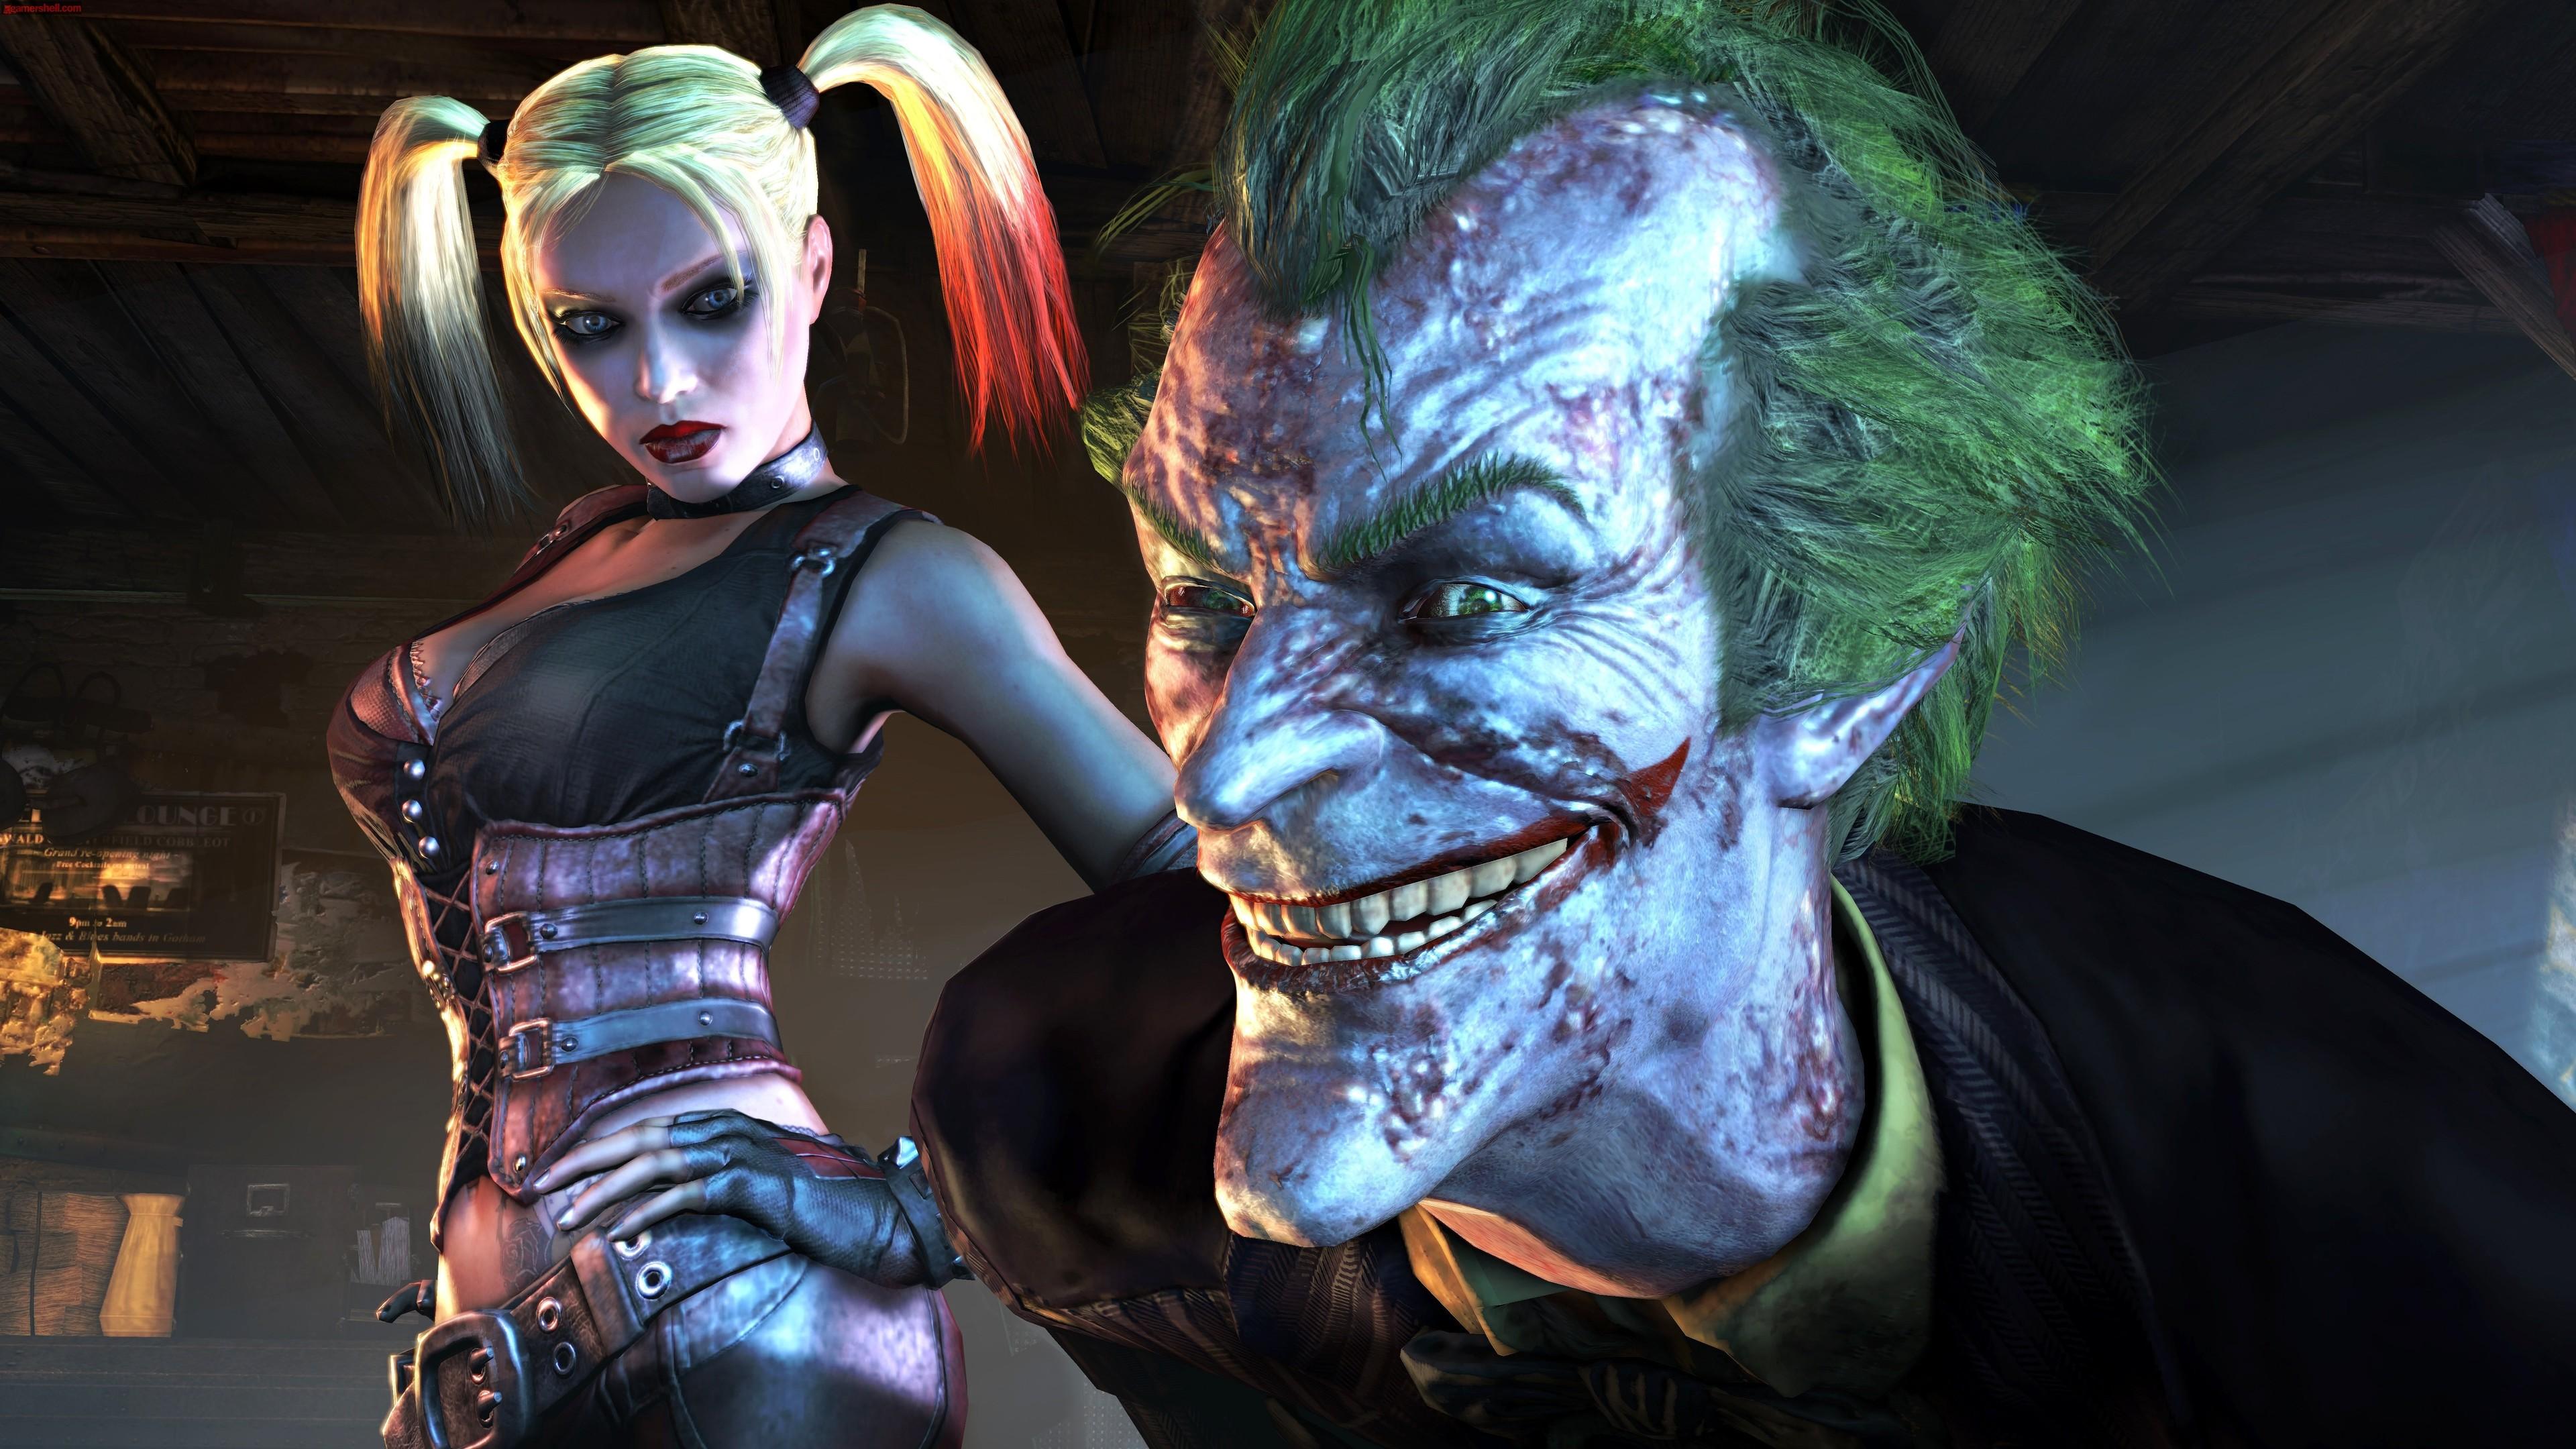 joker and harley quinn 1539452806 - Joker And Harley Quinn - supervillain wallpapers, joker wallpapers, hd-wallpapers, harley quinn wallpapers, digital art wallpapers, artwork wallpapers, 5k wallpapers, 4k-wallpapers